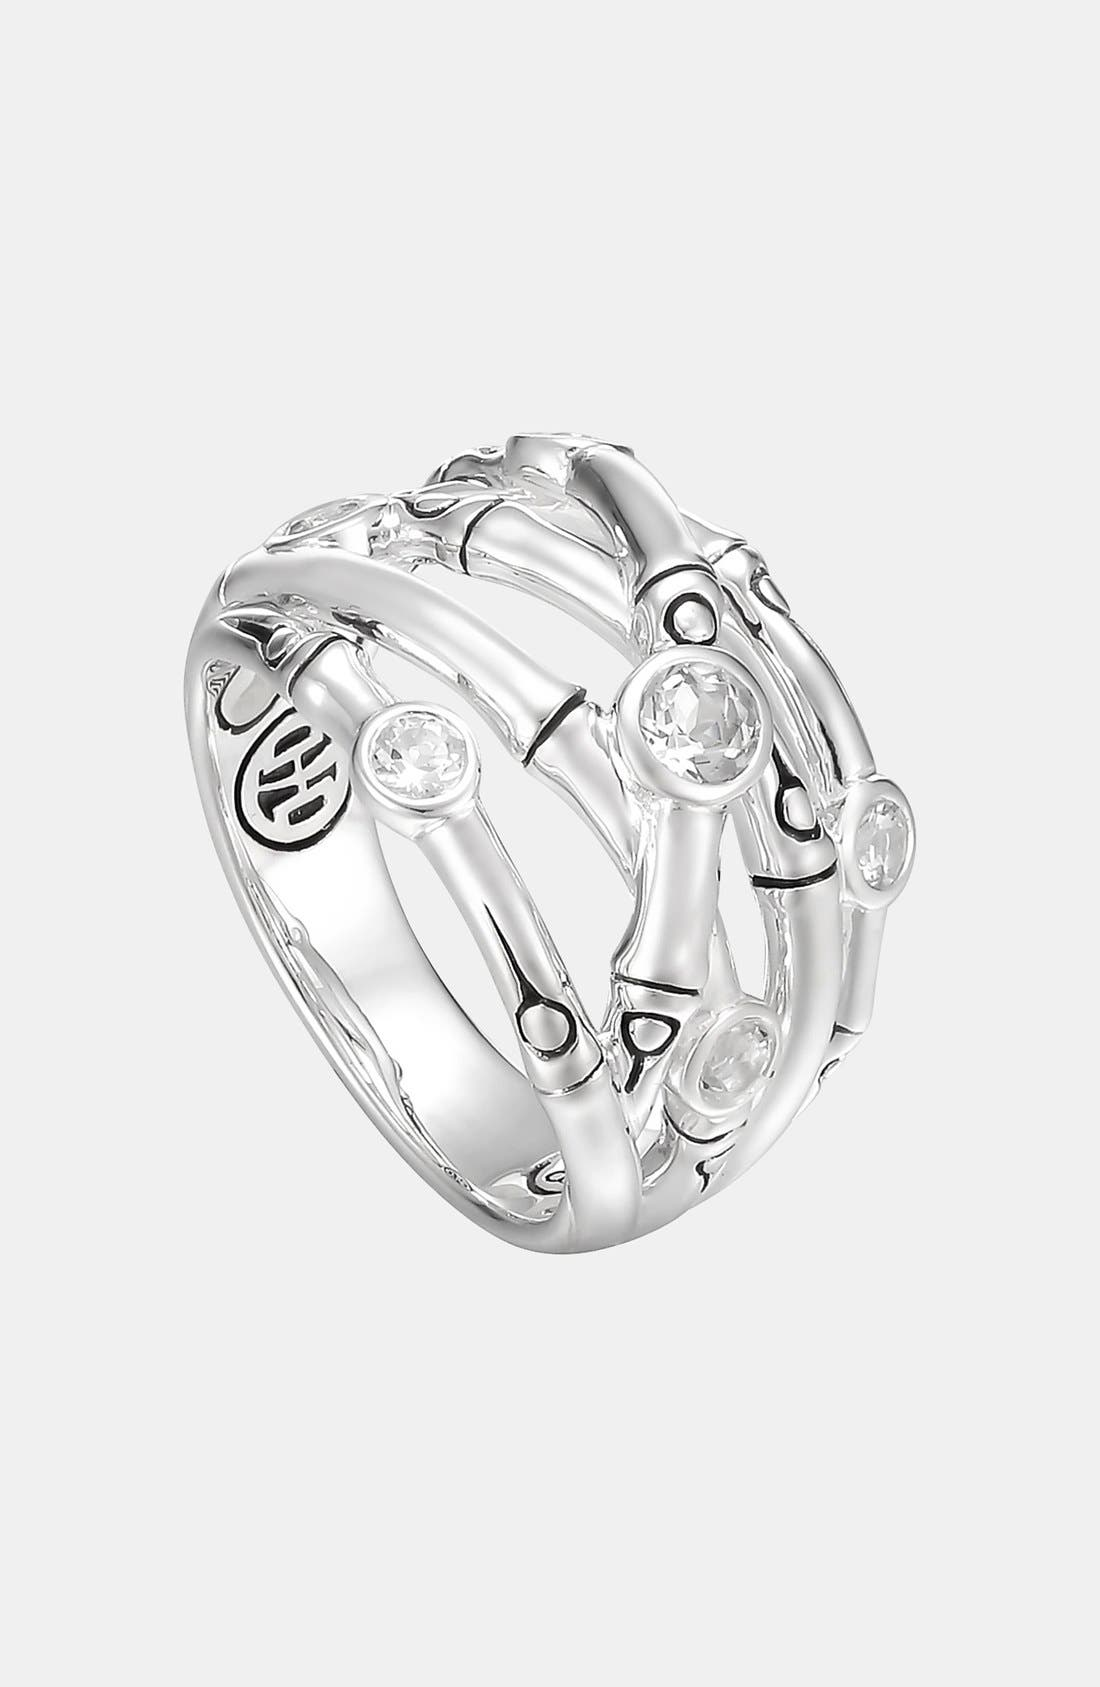 Main Image - John Hardy 'Batu Bamboo' Woven Silver Ring